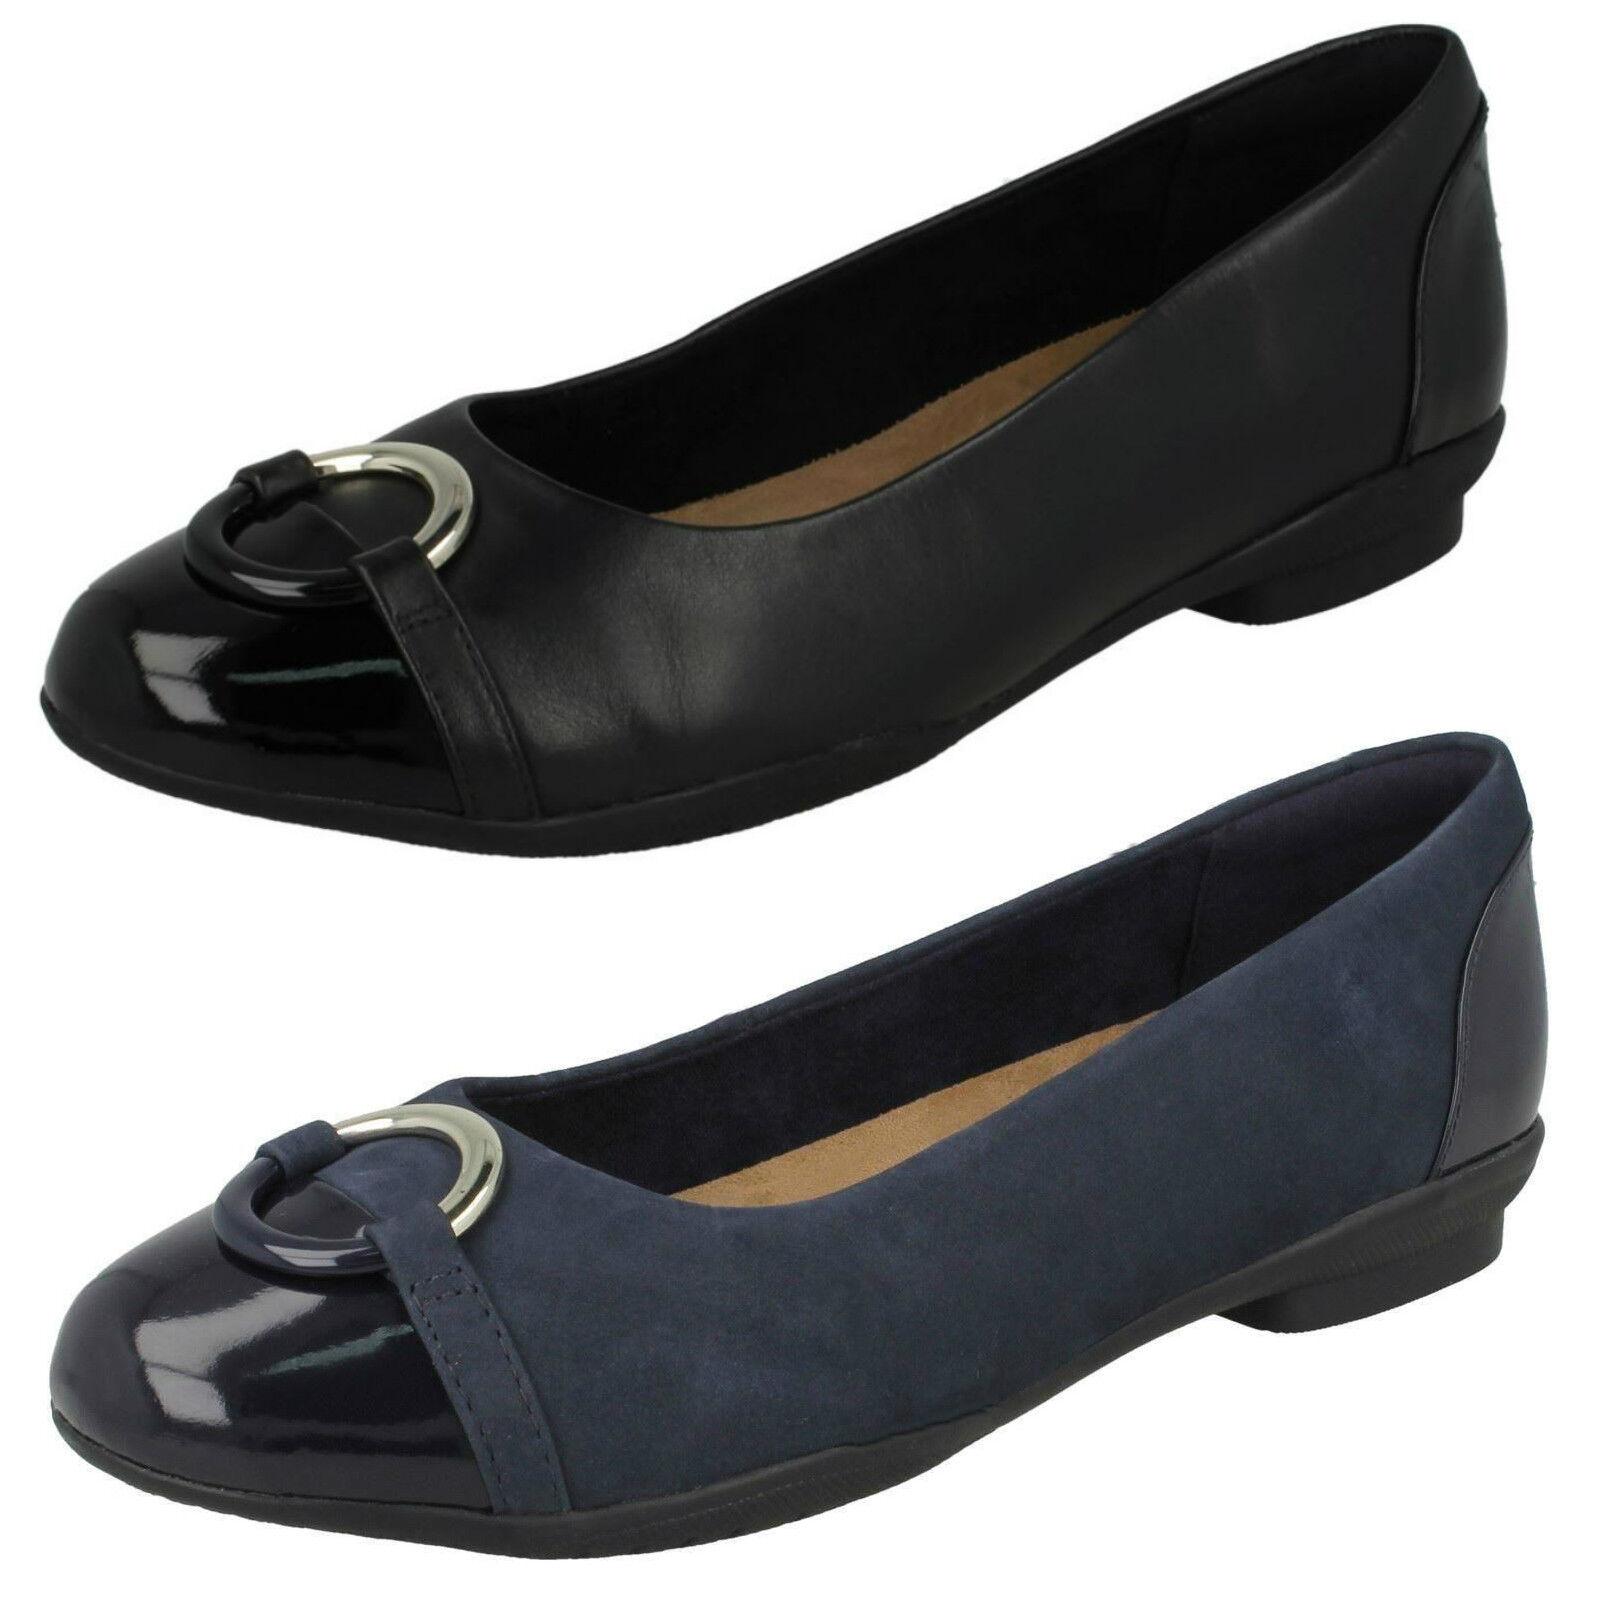 Damen Leder Clarks Neenah Rebe schwarz oder Marinebalu Leder Damen flache Pumps E passend 7a8daa